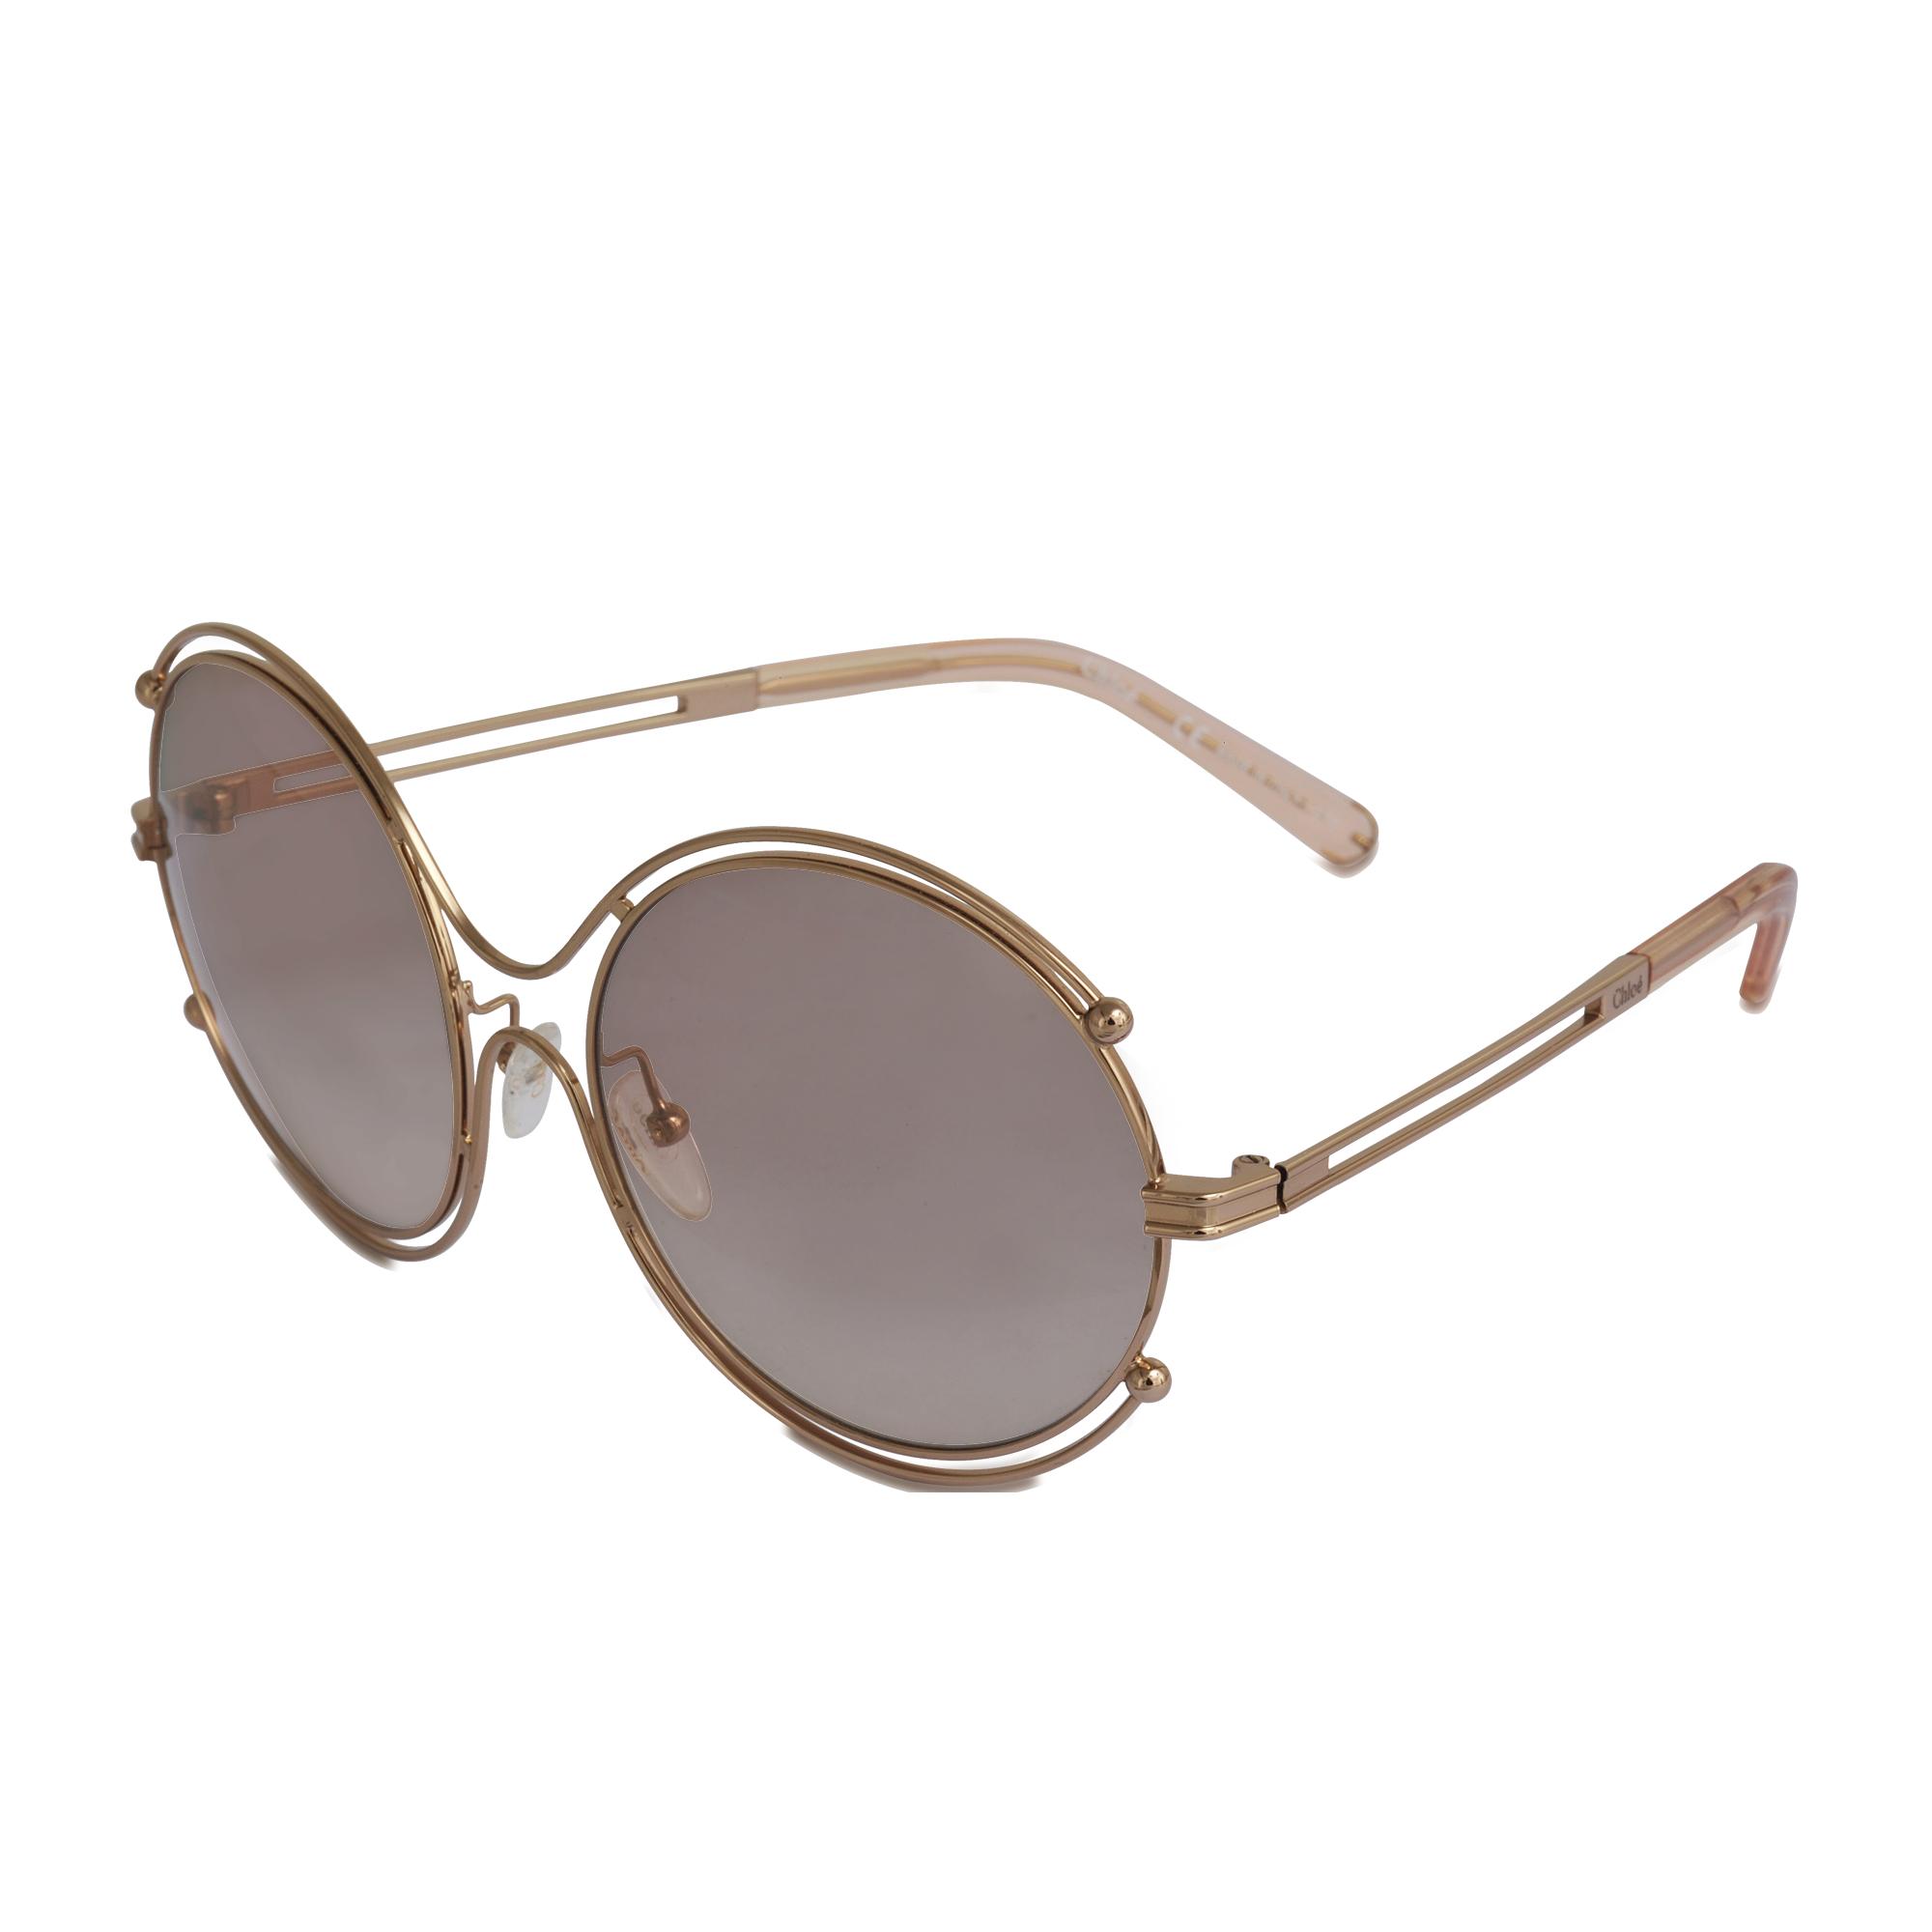 0f6b04c5a931d Chloe Isidora Round Sunglasses